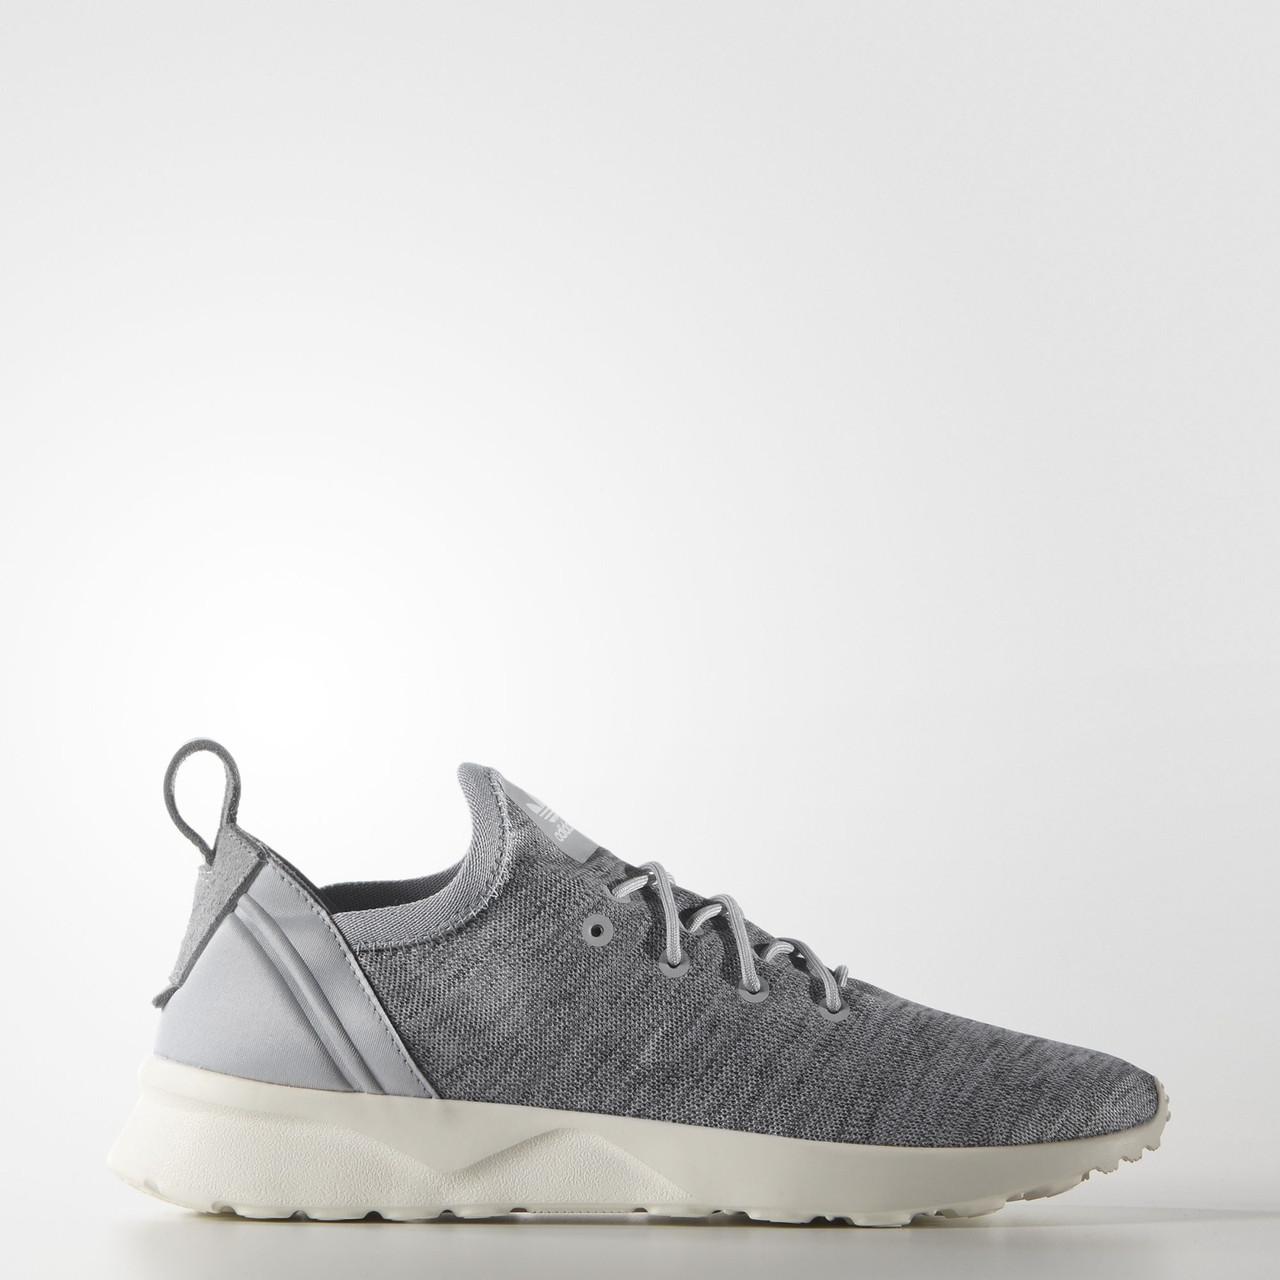 Кроссовки женские Adidas ZX Flux ADV Virtue W BB0745